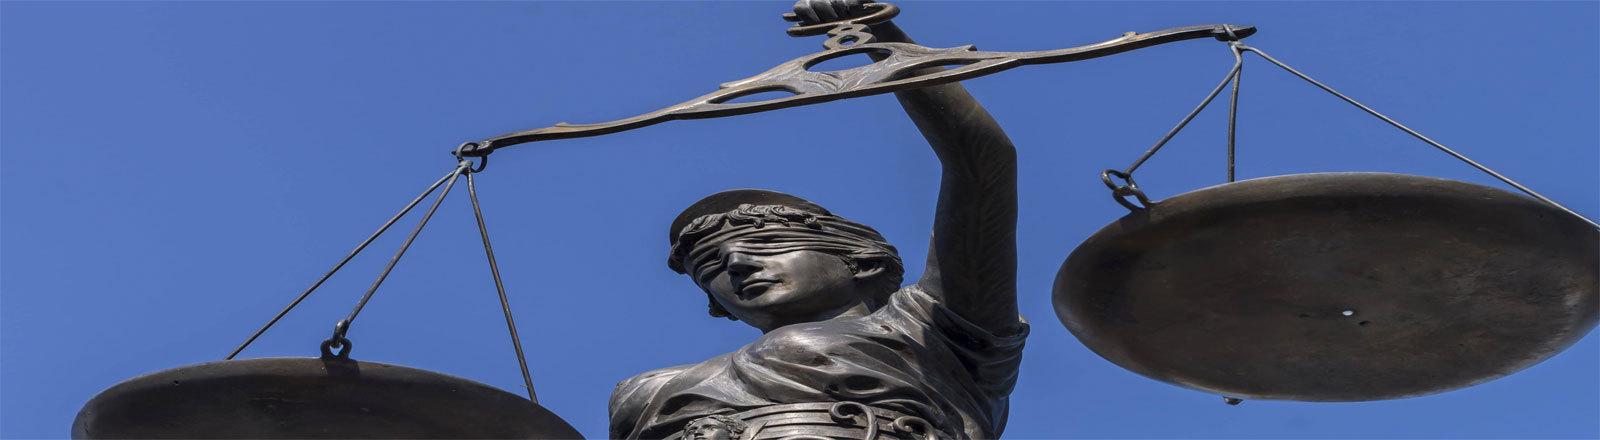 Justitia Figur Bayern